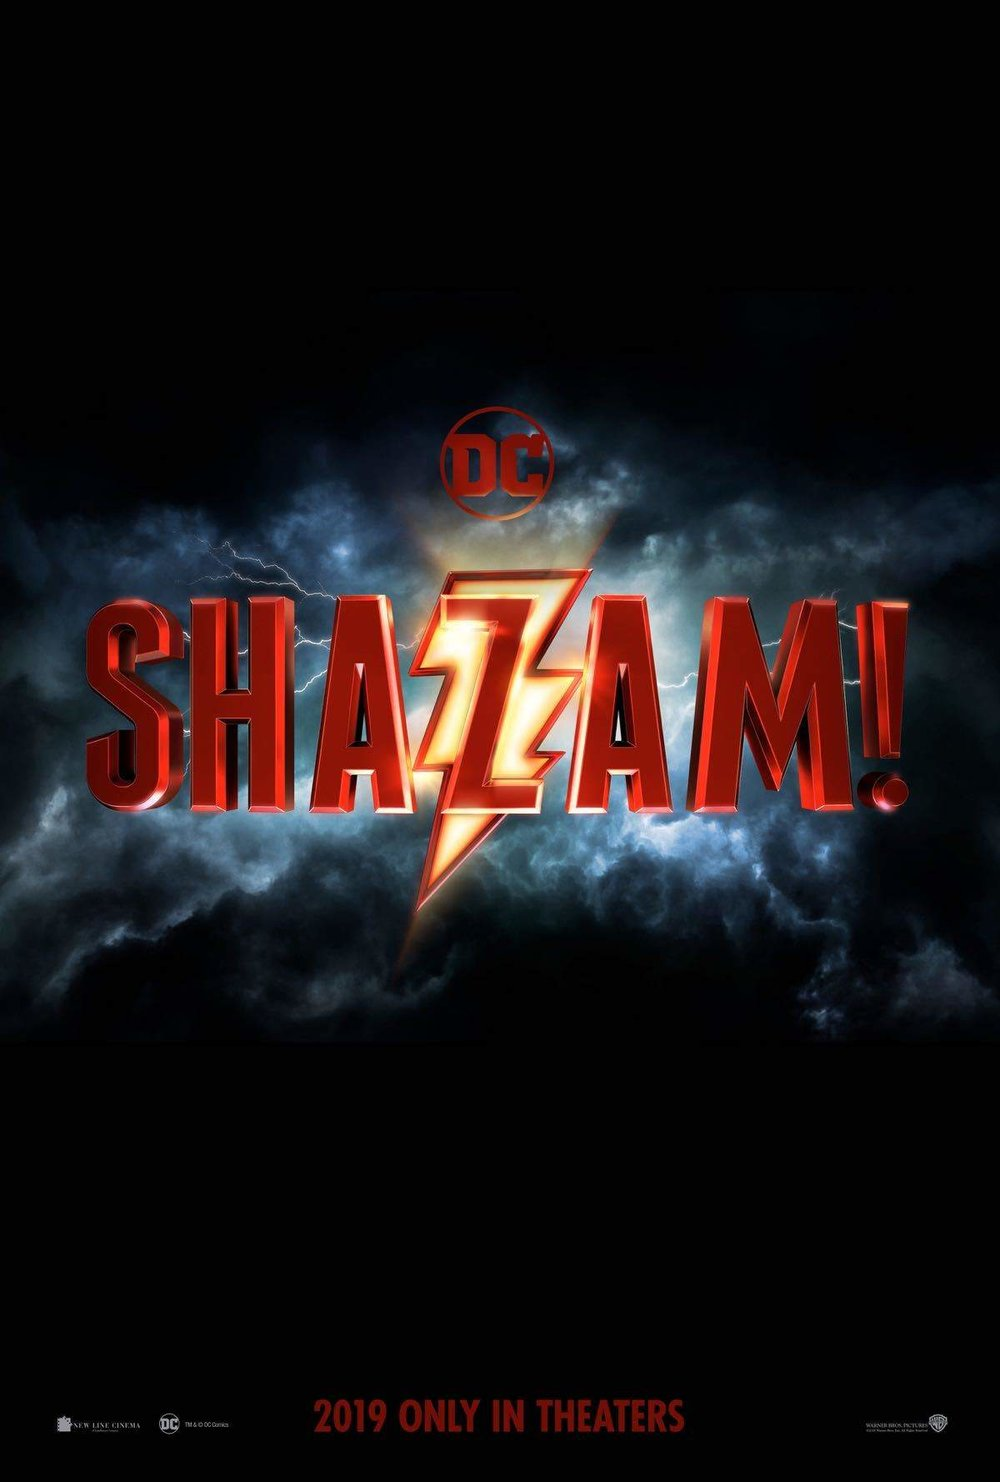 the-official-logo-of-shazam-revealed-in-teaser-poster11